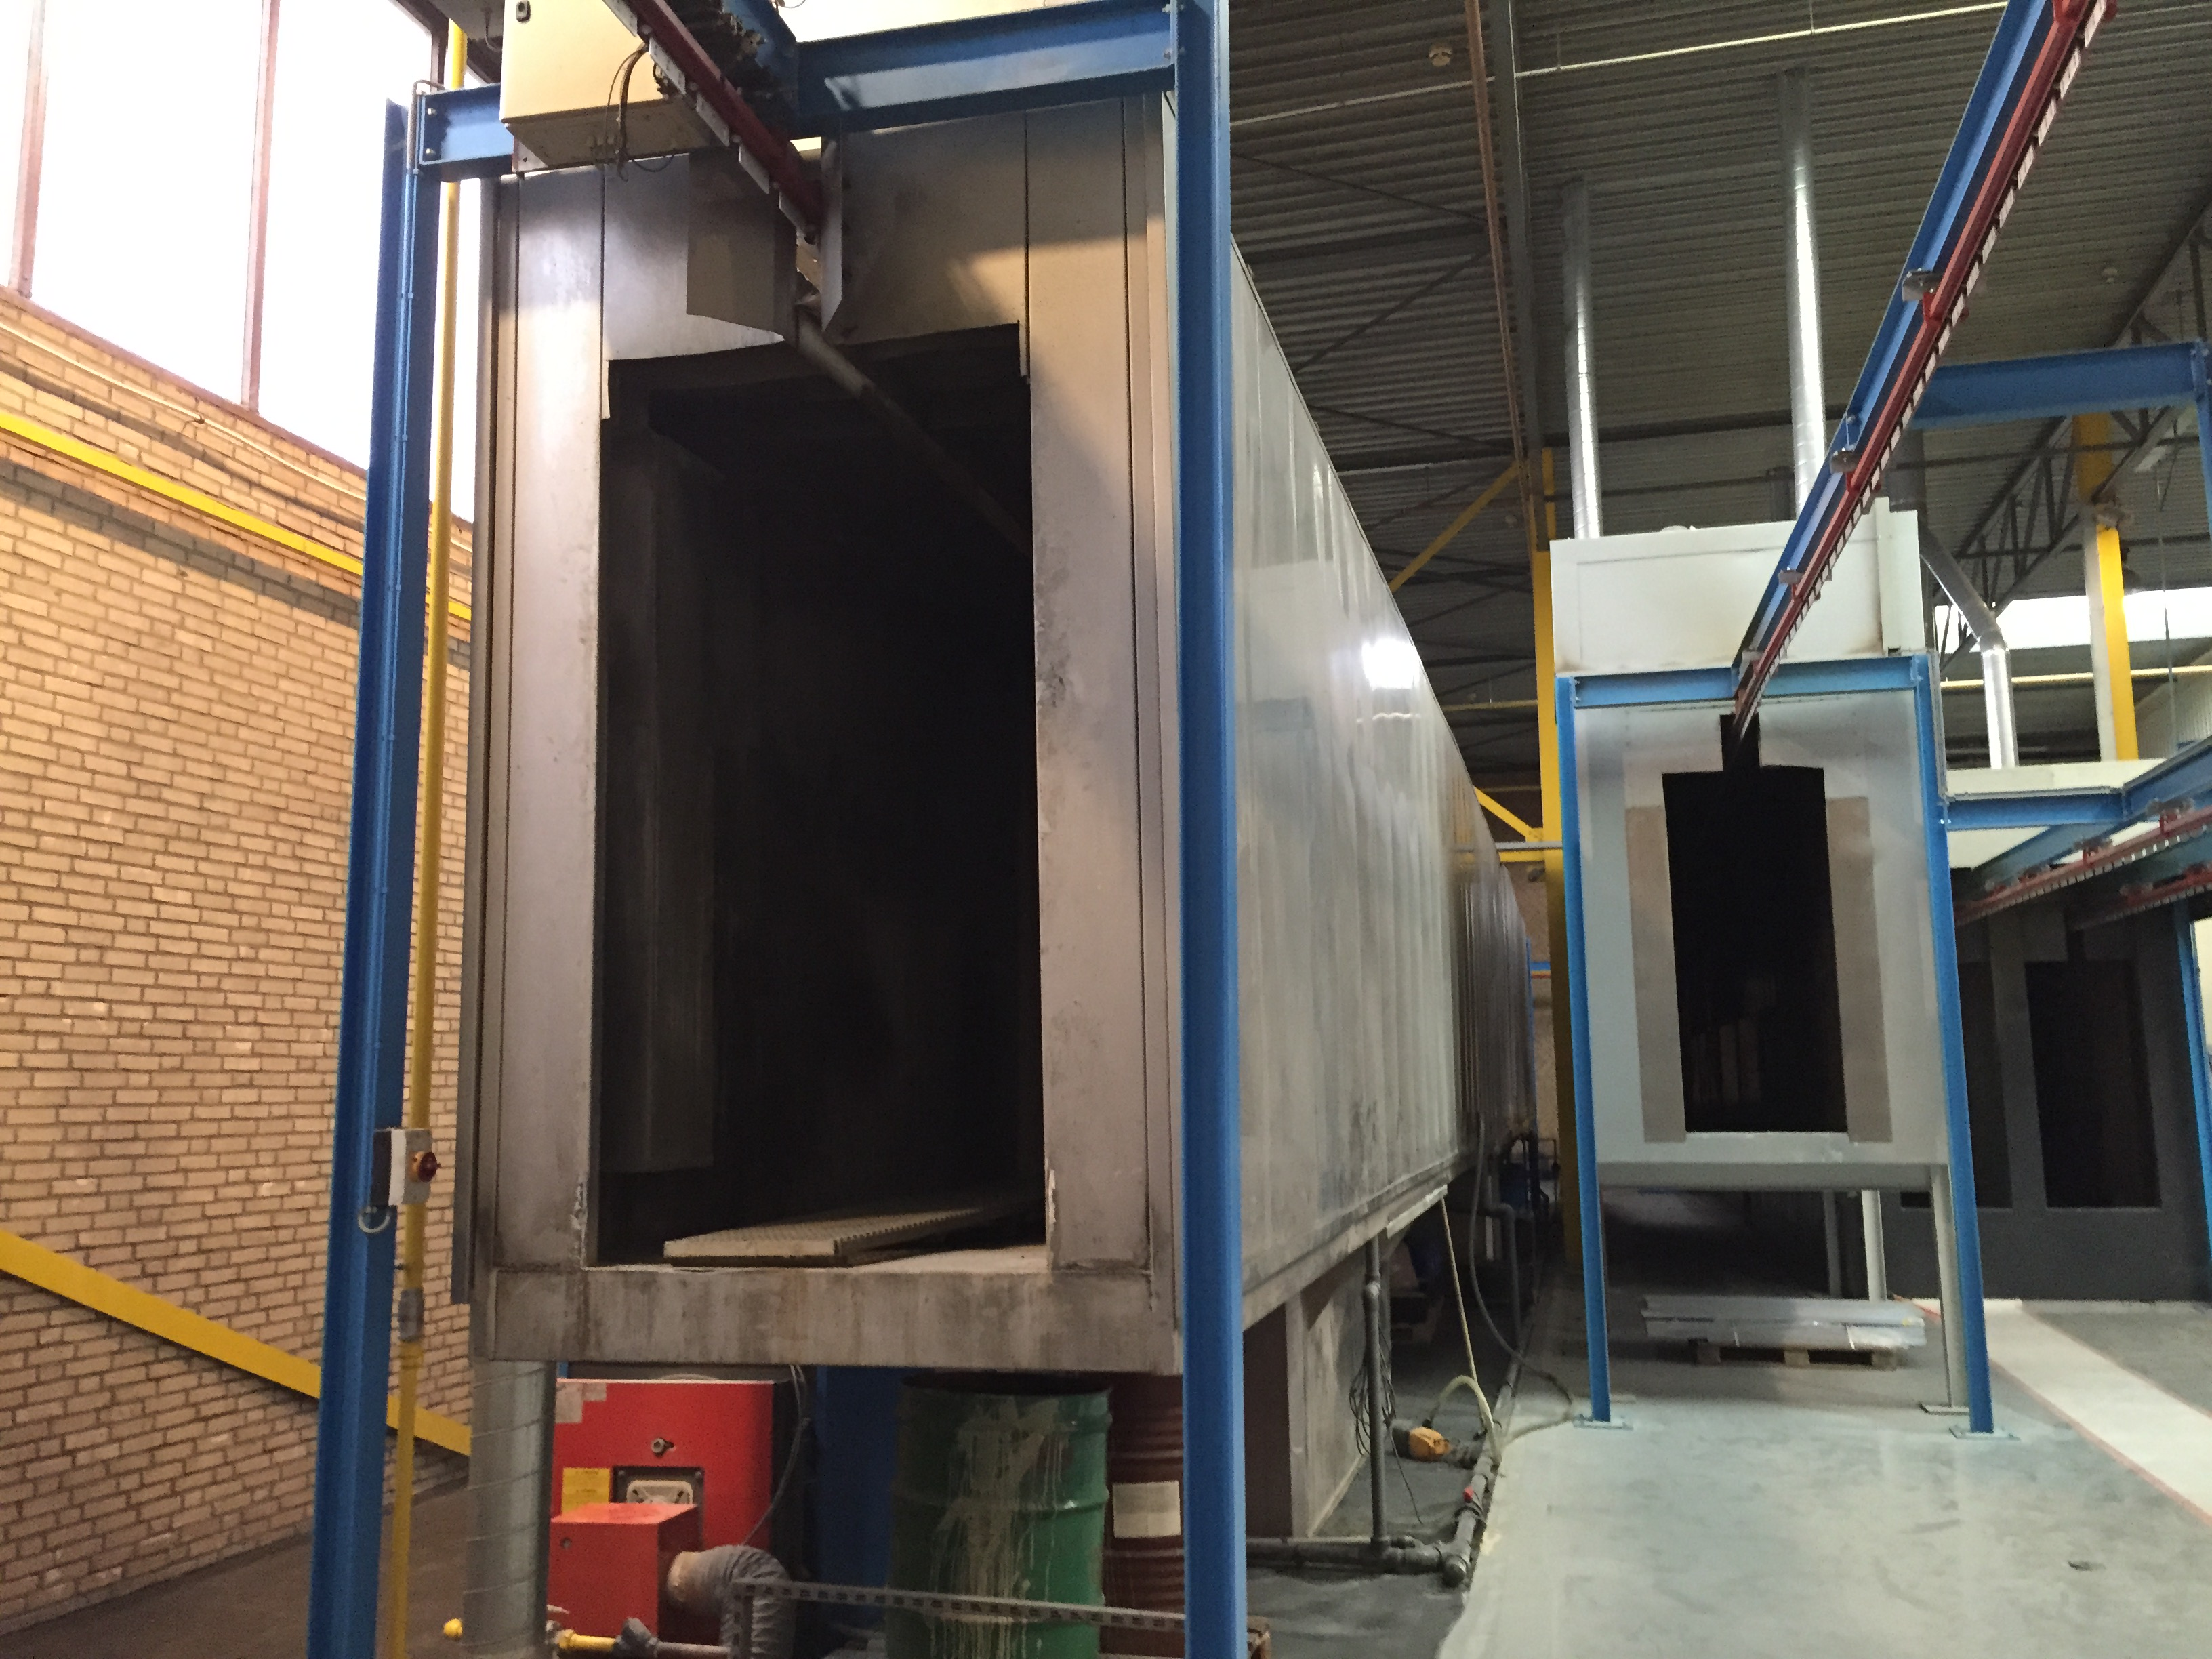 ovens-20141018